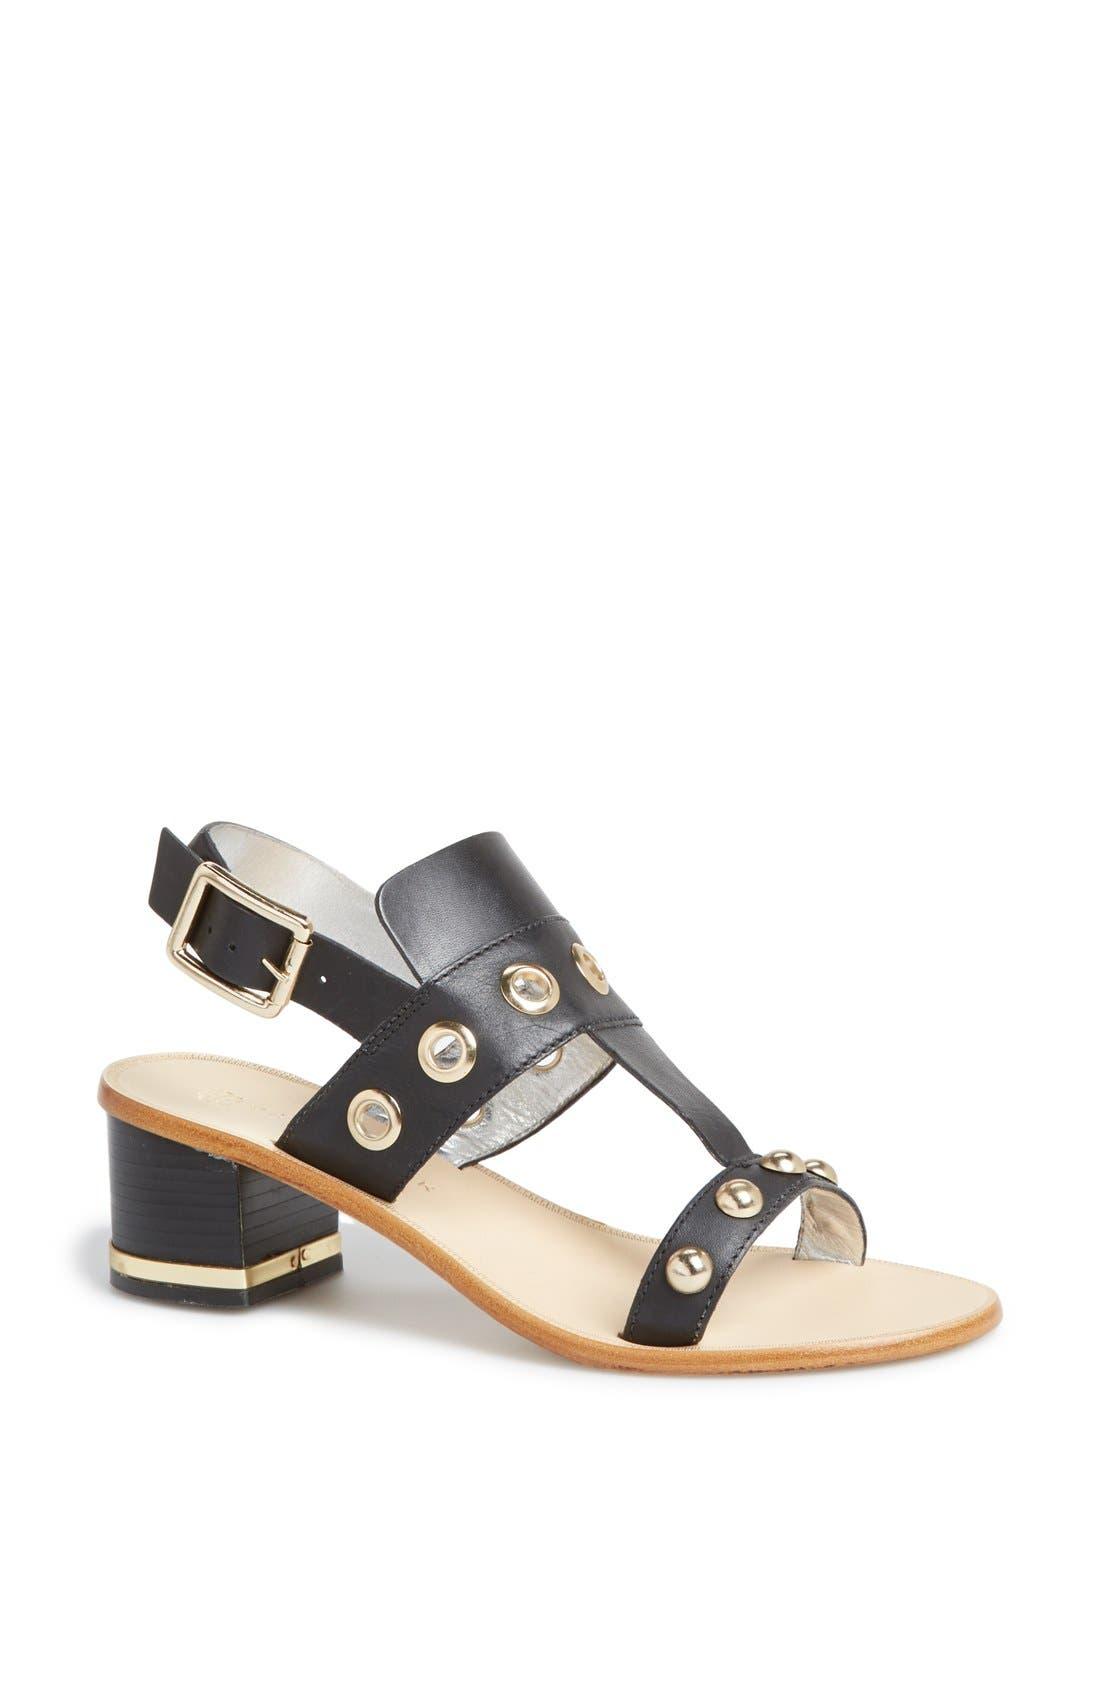 Alternate Image 1 Selected - Trina Turk 'Atwater' Studded Slingback Sandal